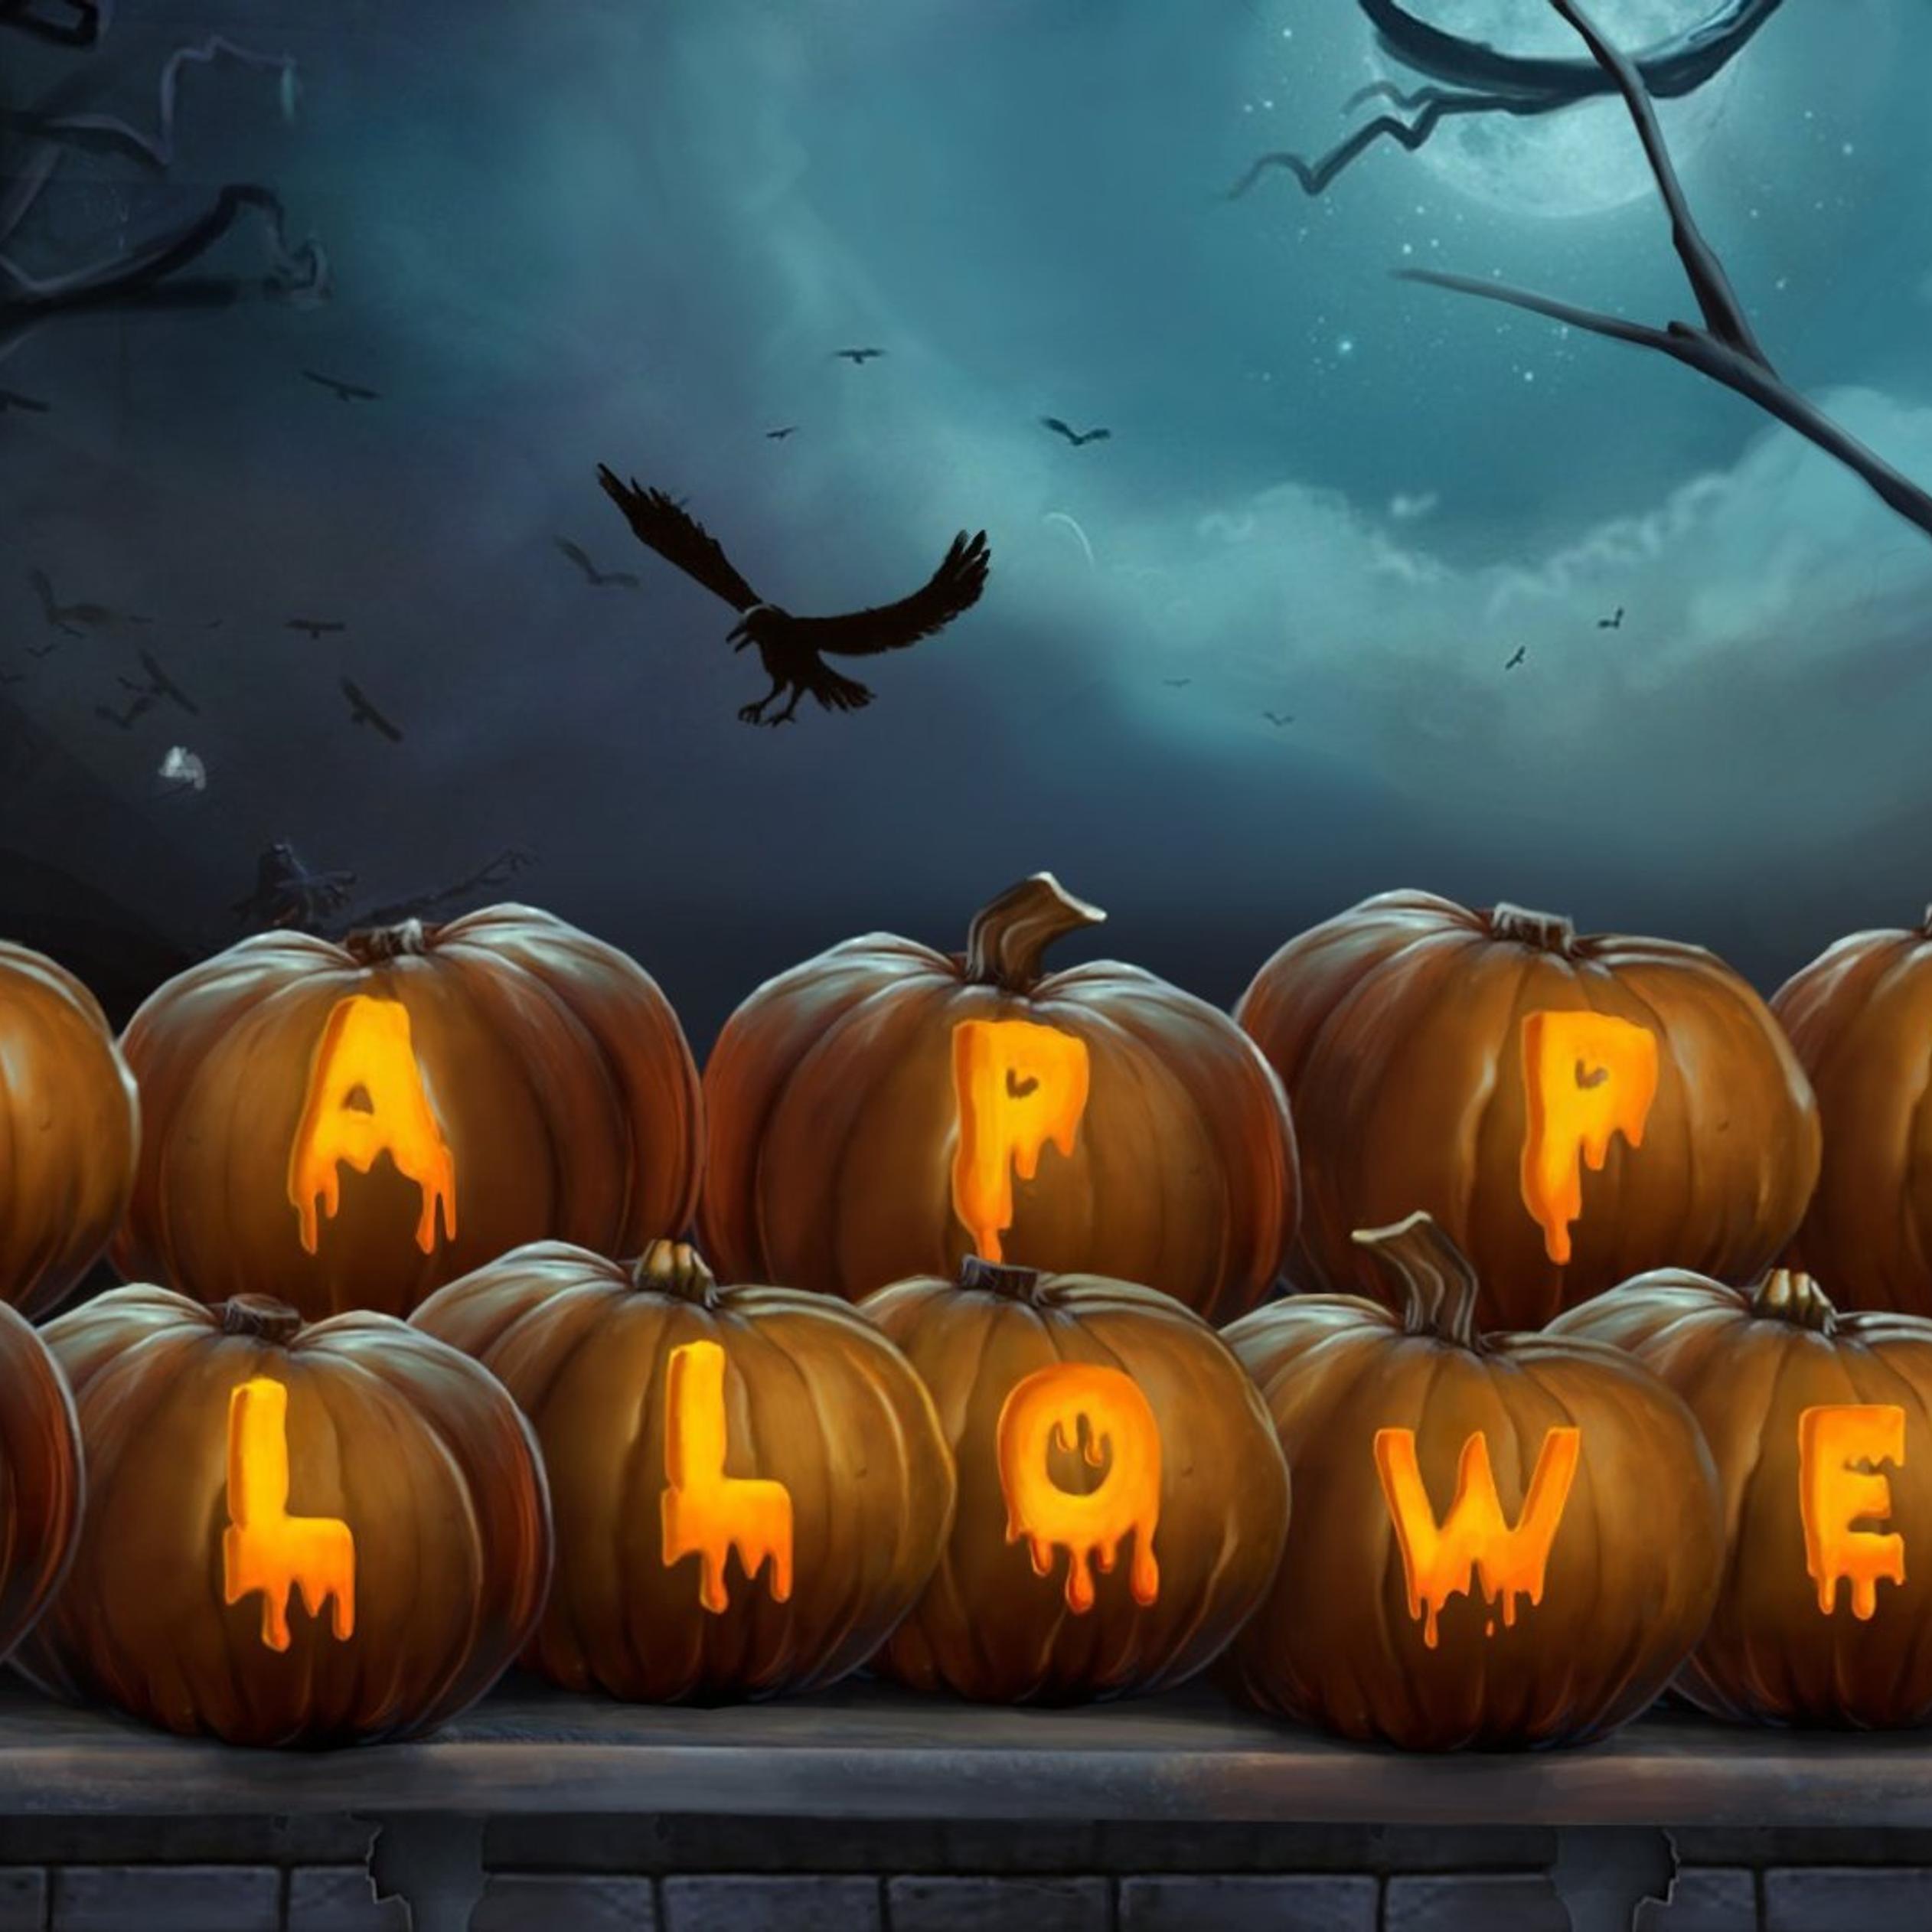 happy halloween write on pumpkins hd